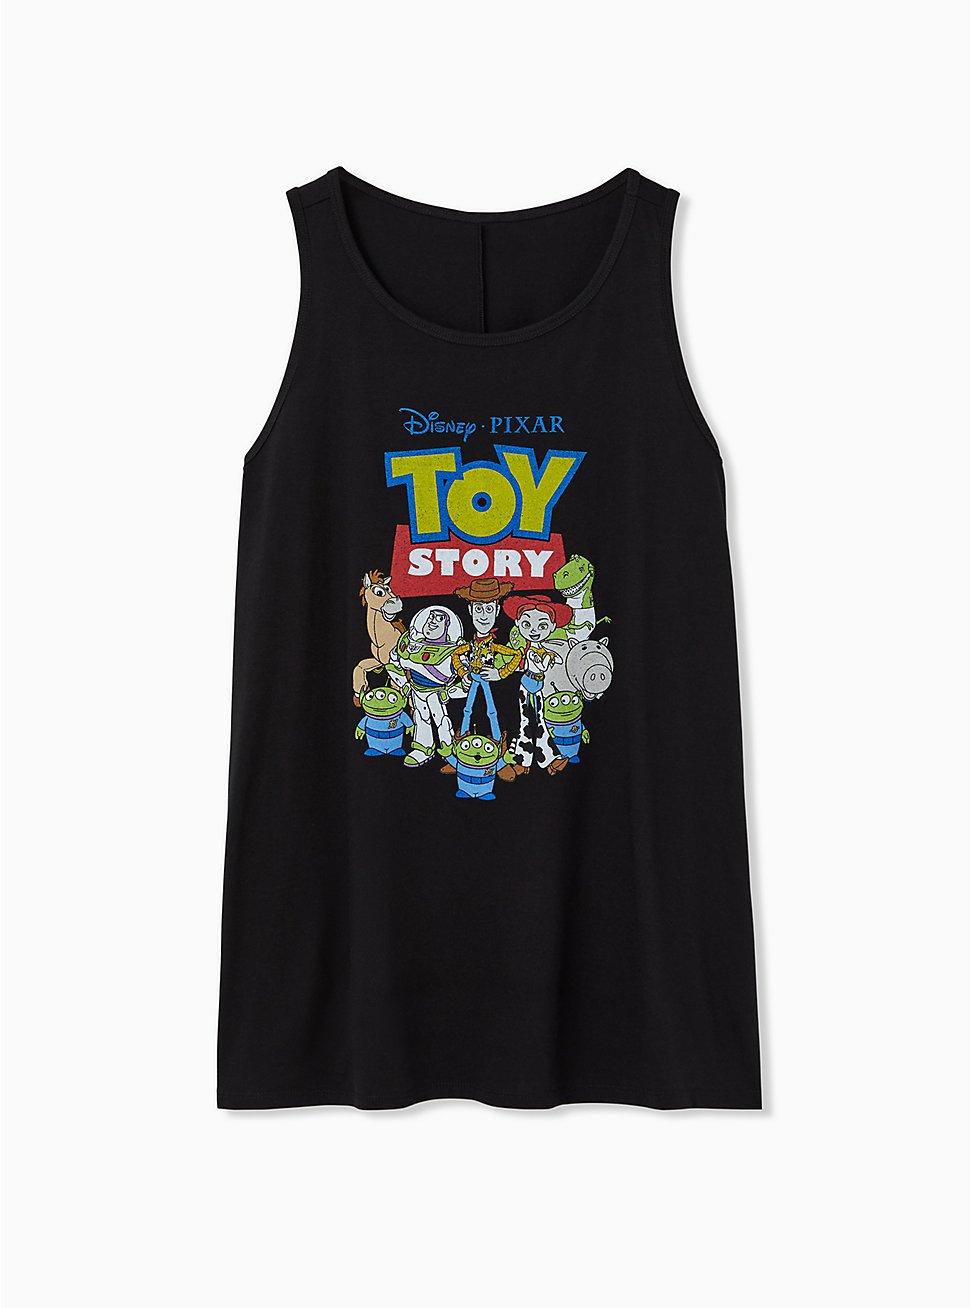 Disney Pixar Toy Story Black Crew Tank, DEEP BLACK, hi-res